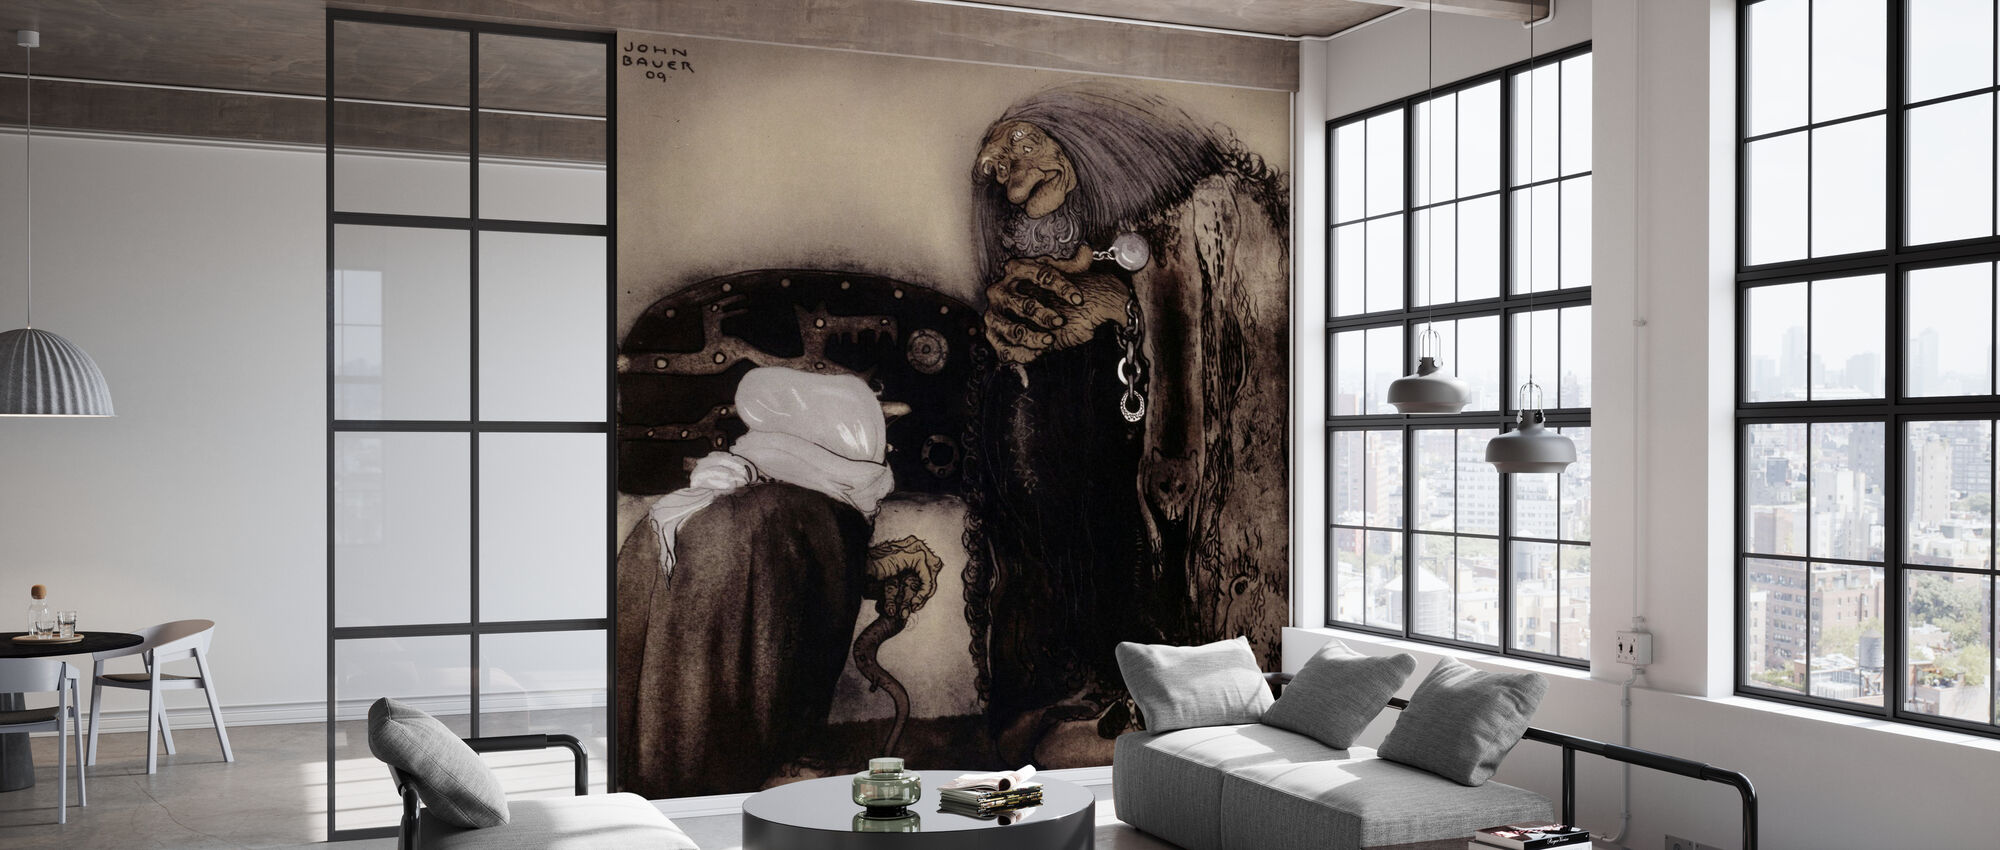 John Bauer - The Four Trollers - Wallpaper - Office